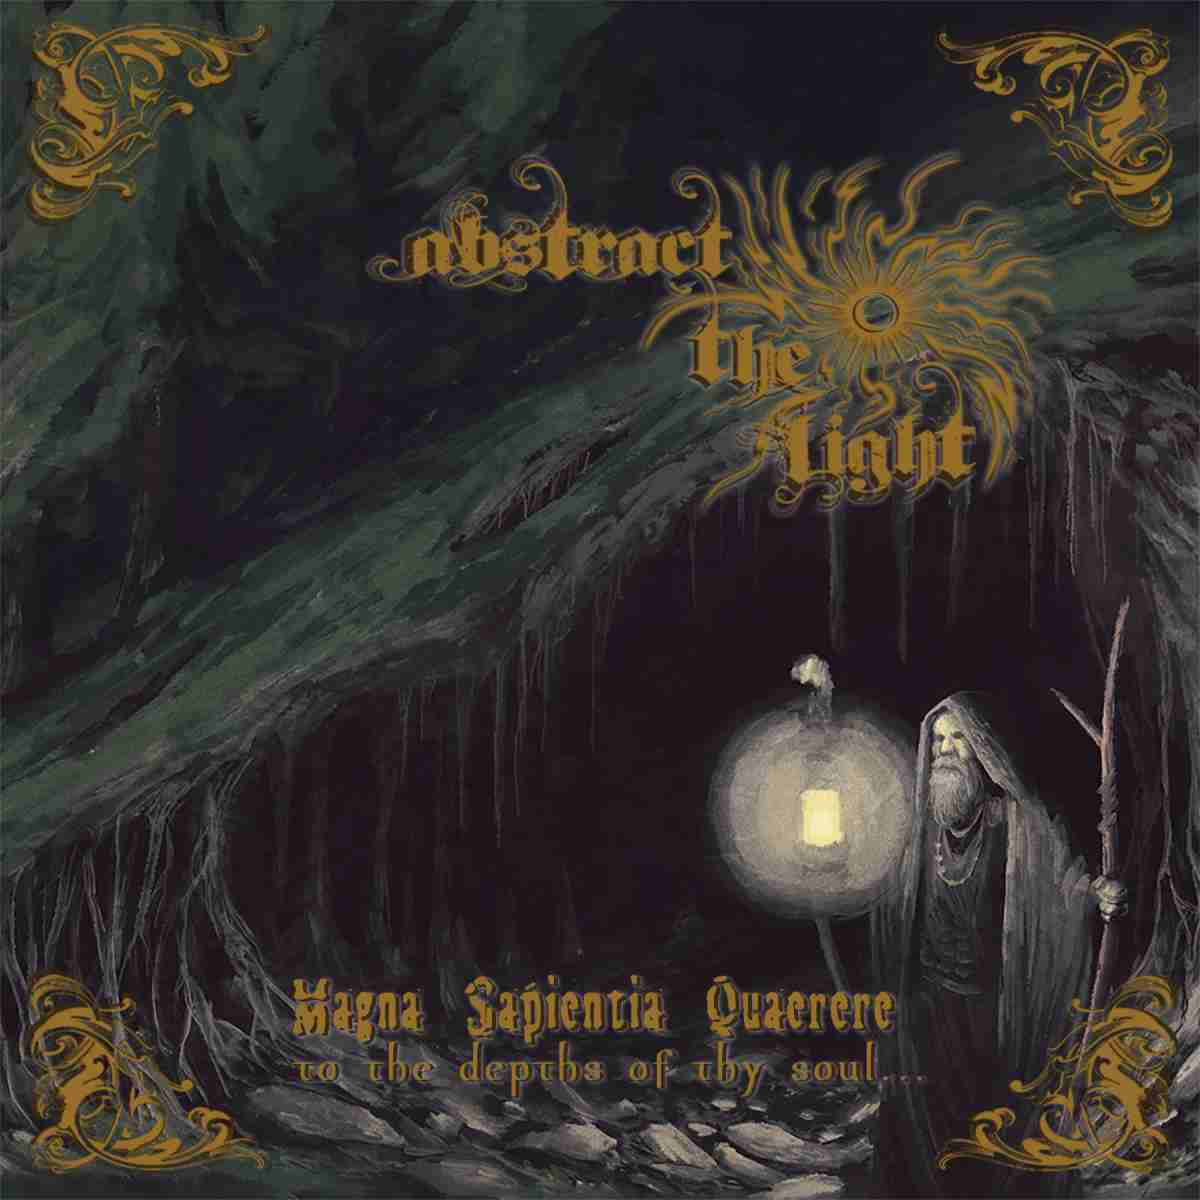 Abstract The Light - Magna Sapientia Quaerere - album cover